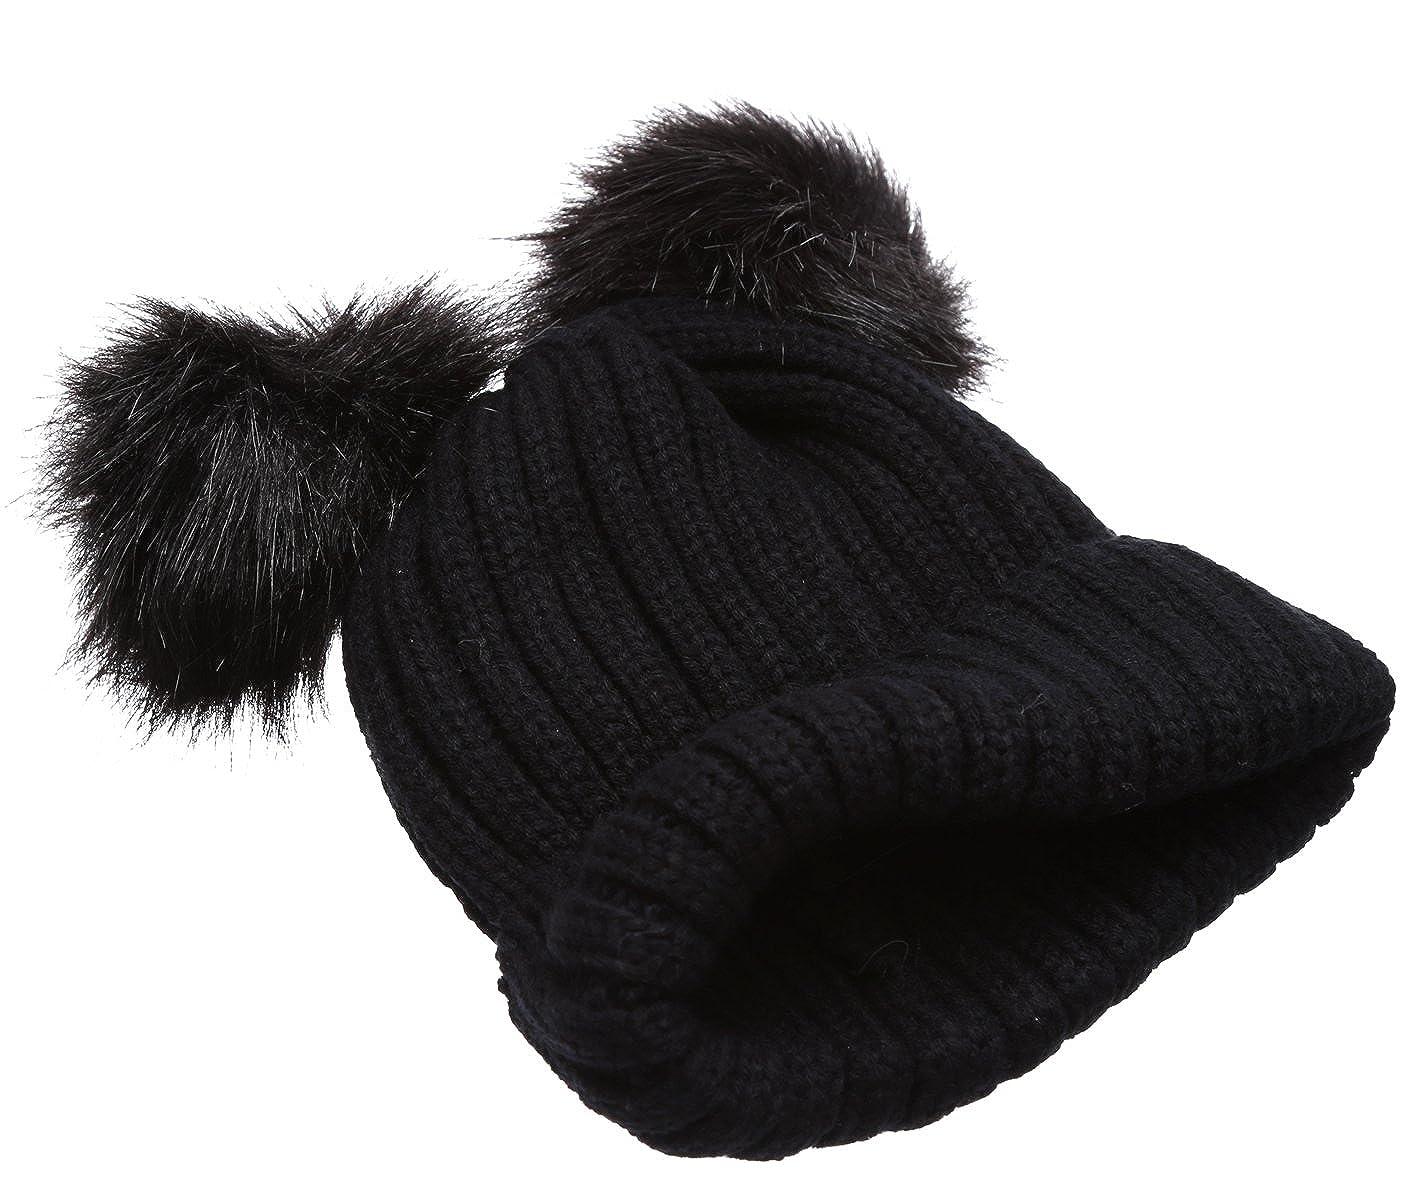 3fb85b9fad7e6 Women s Winter Chunky Knit Double Pom Pom Beanie Hat With Hair Tie.(Black)  at Amazon Women s Clothing store